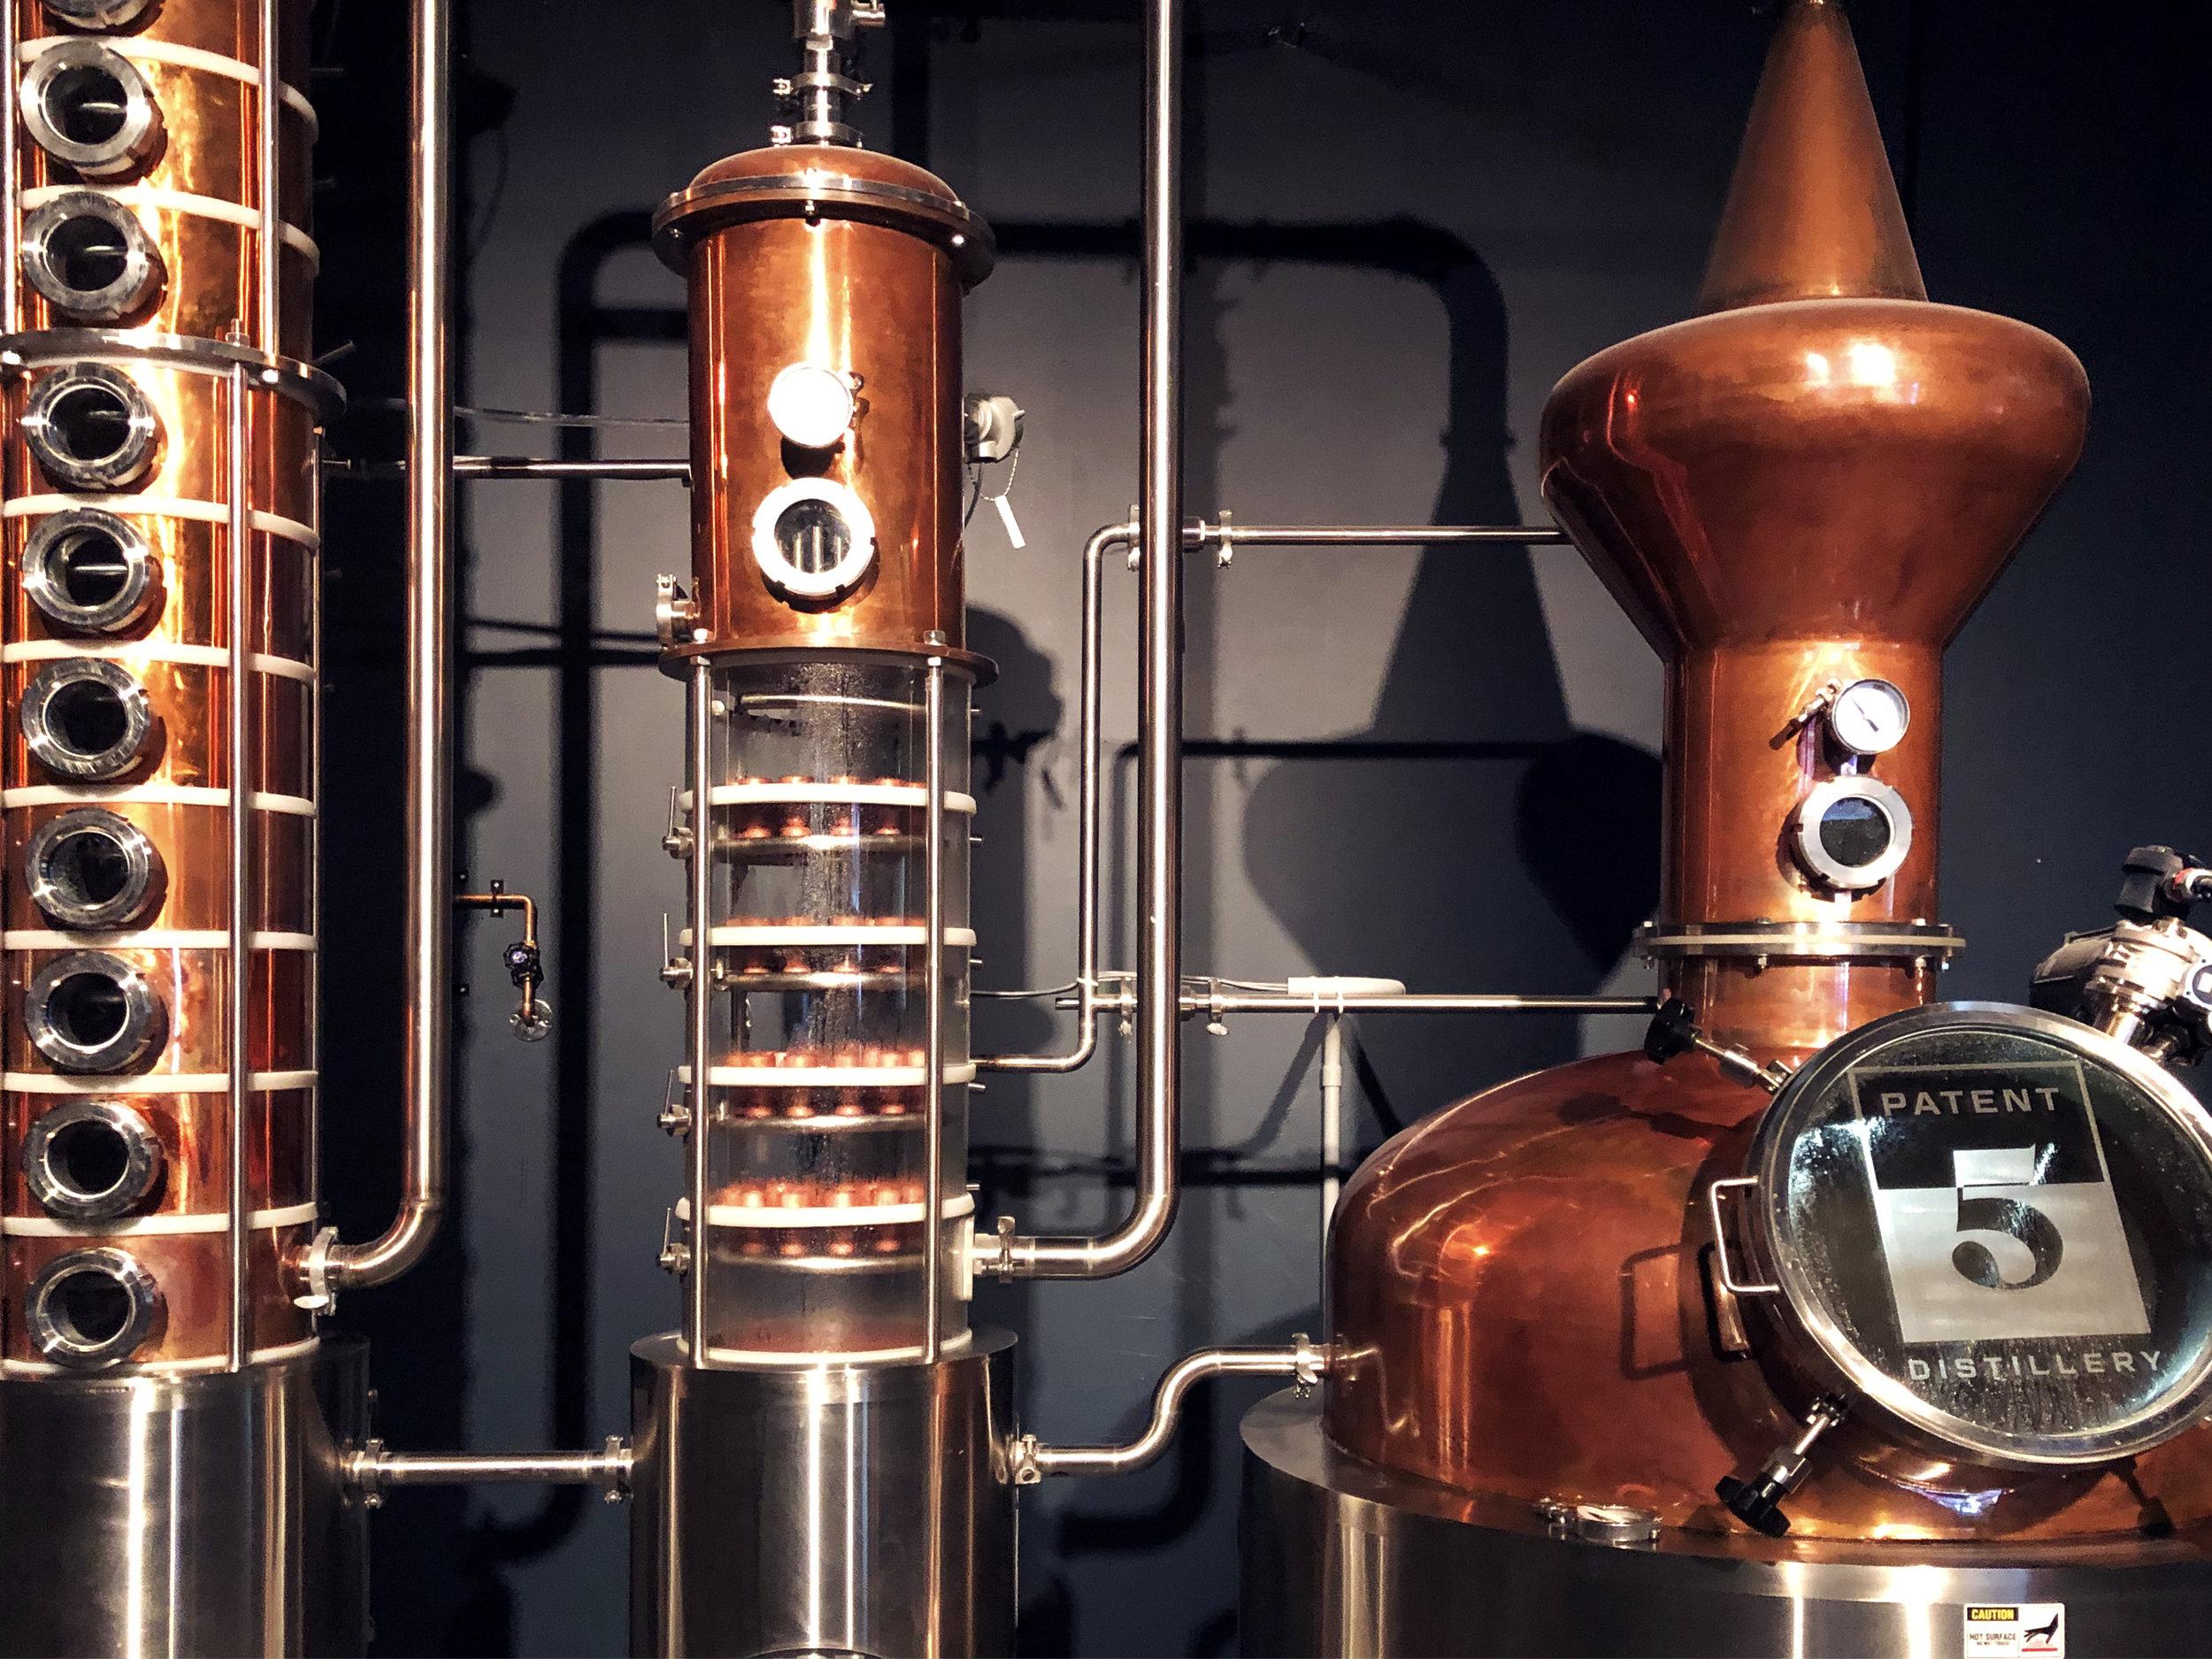 Patent 5 Distillery 2.jpg